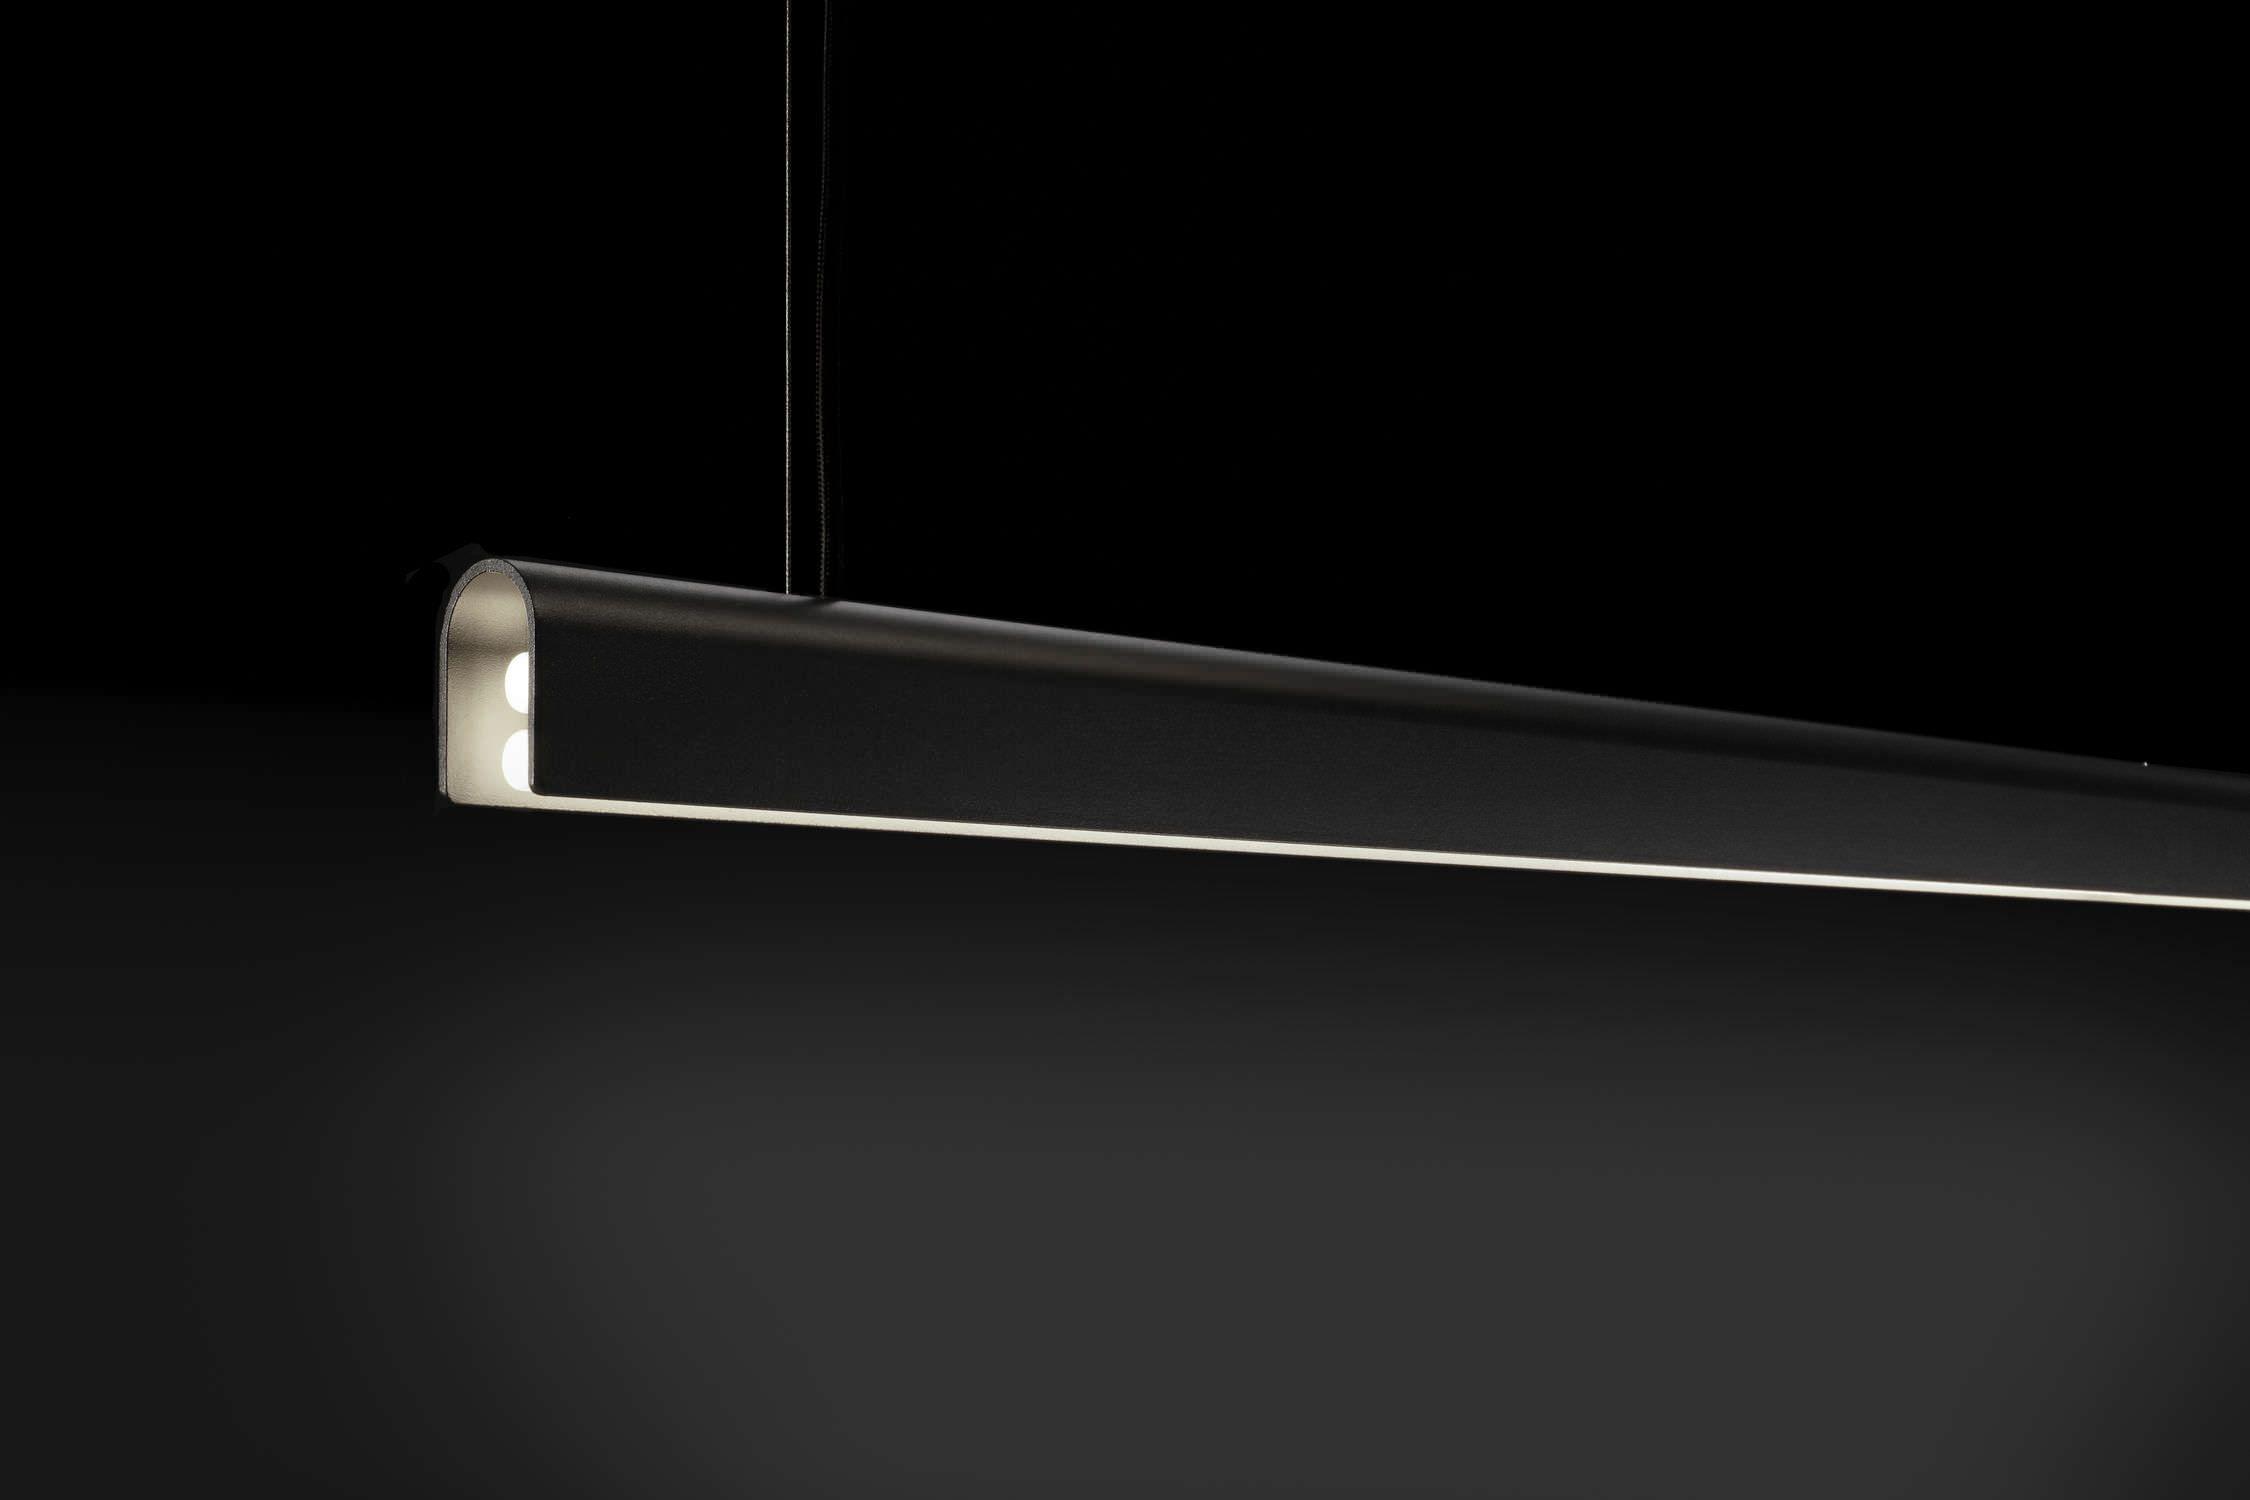 linear light fixture  suspended  fluorescent lights  ulight . linear light fixture  suspended  fluorescent lights  ulight   tossb